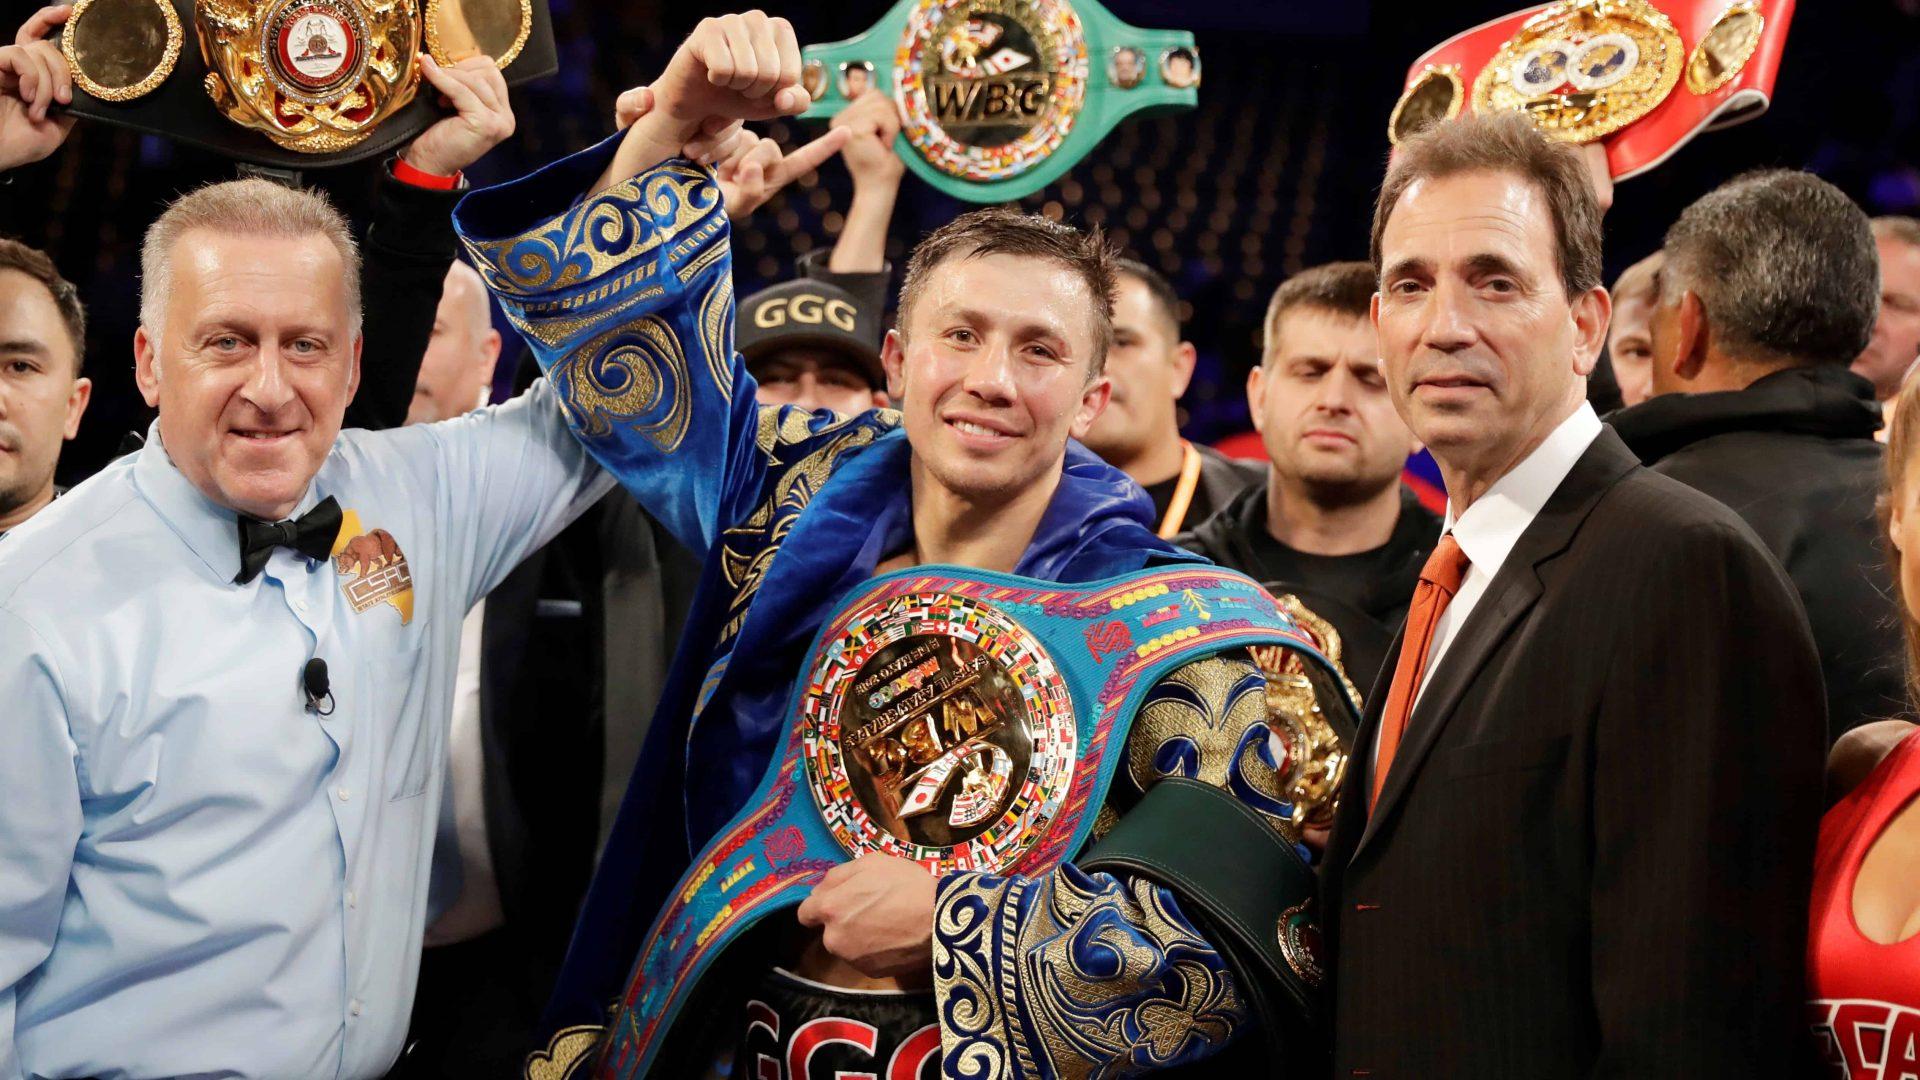 Gennady Golovkin korábbi IBO/IBF/WBA/WBC középsúlyú világbajnok.